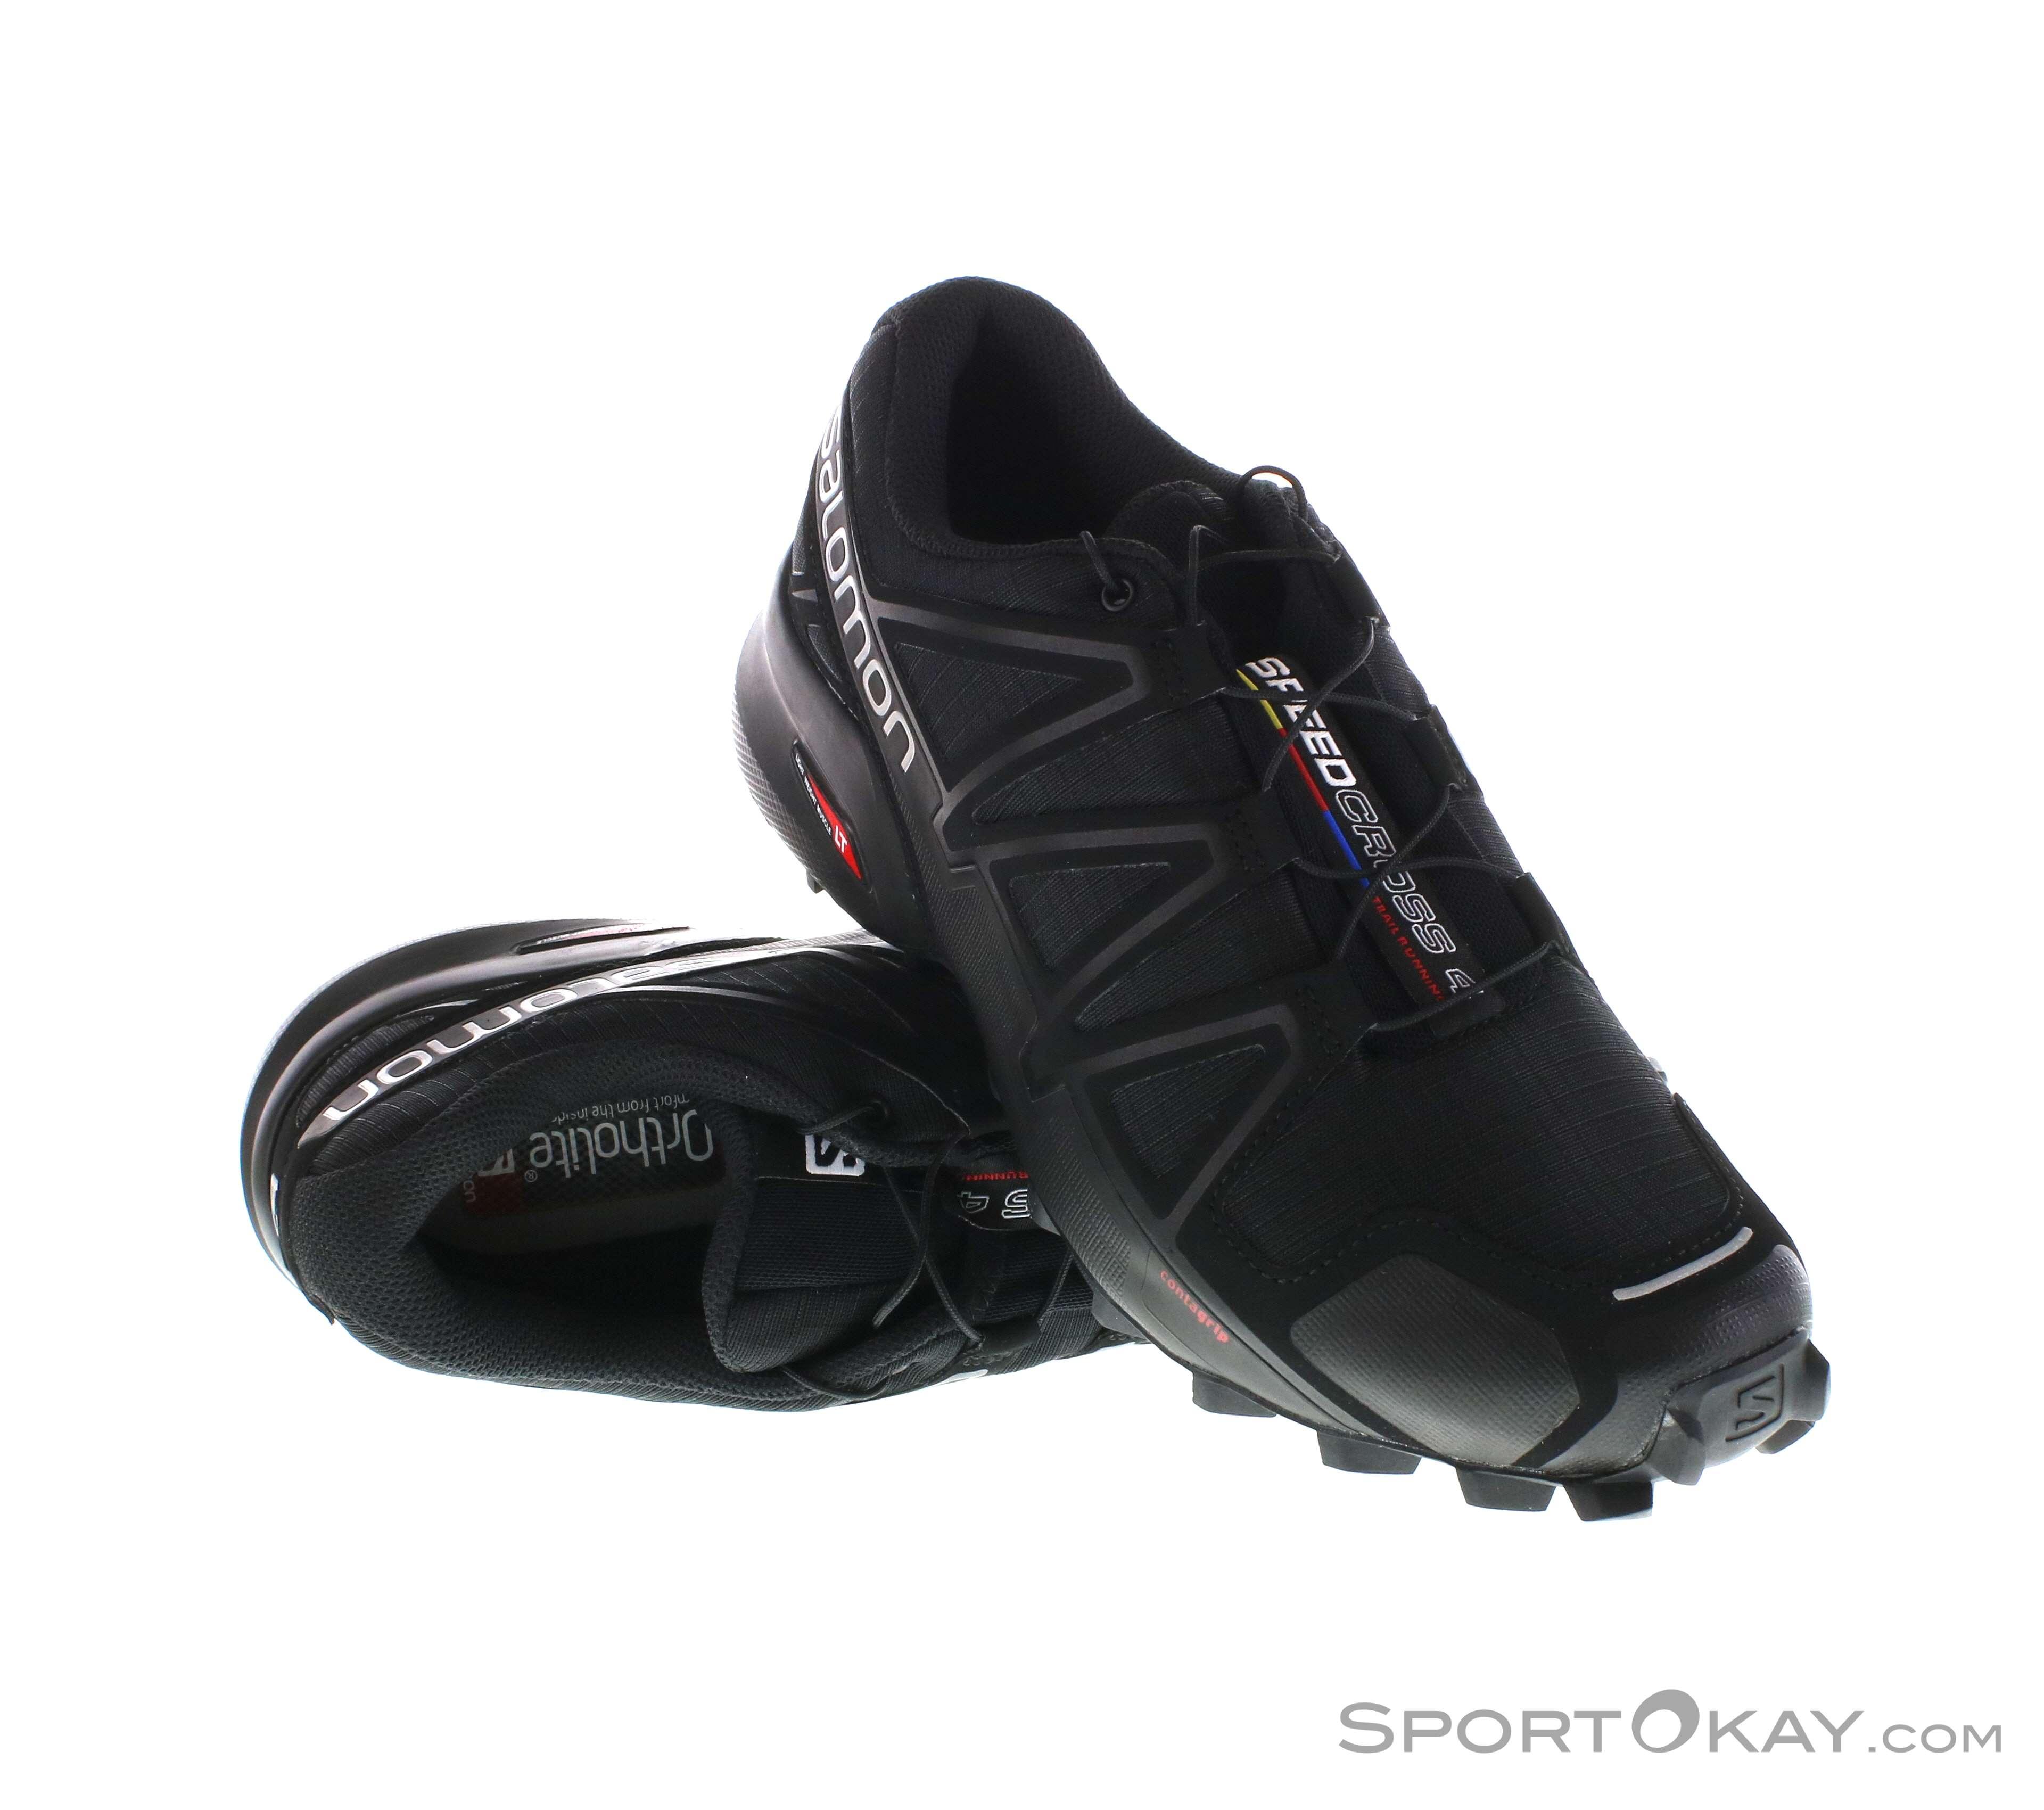 Salomon Speedcross 4 Damen Traillaufschuhe-Schwarz-8